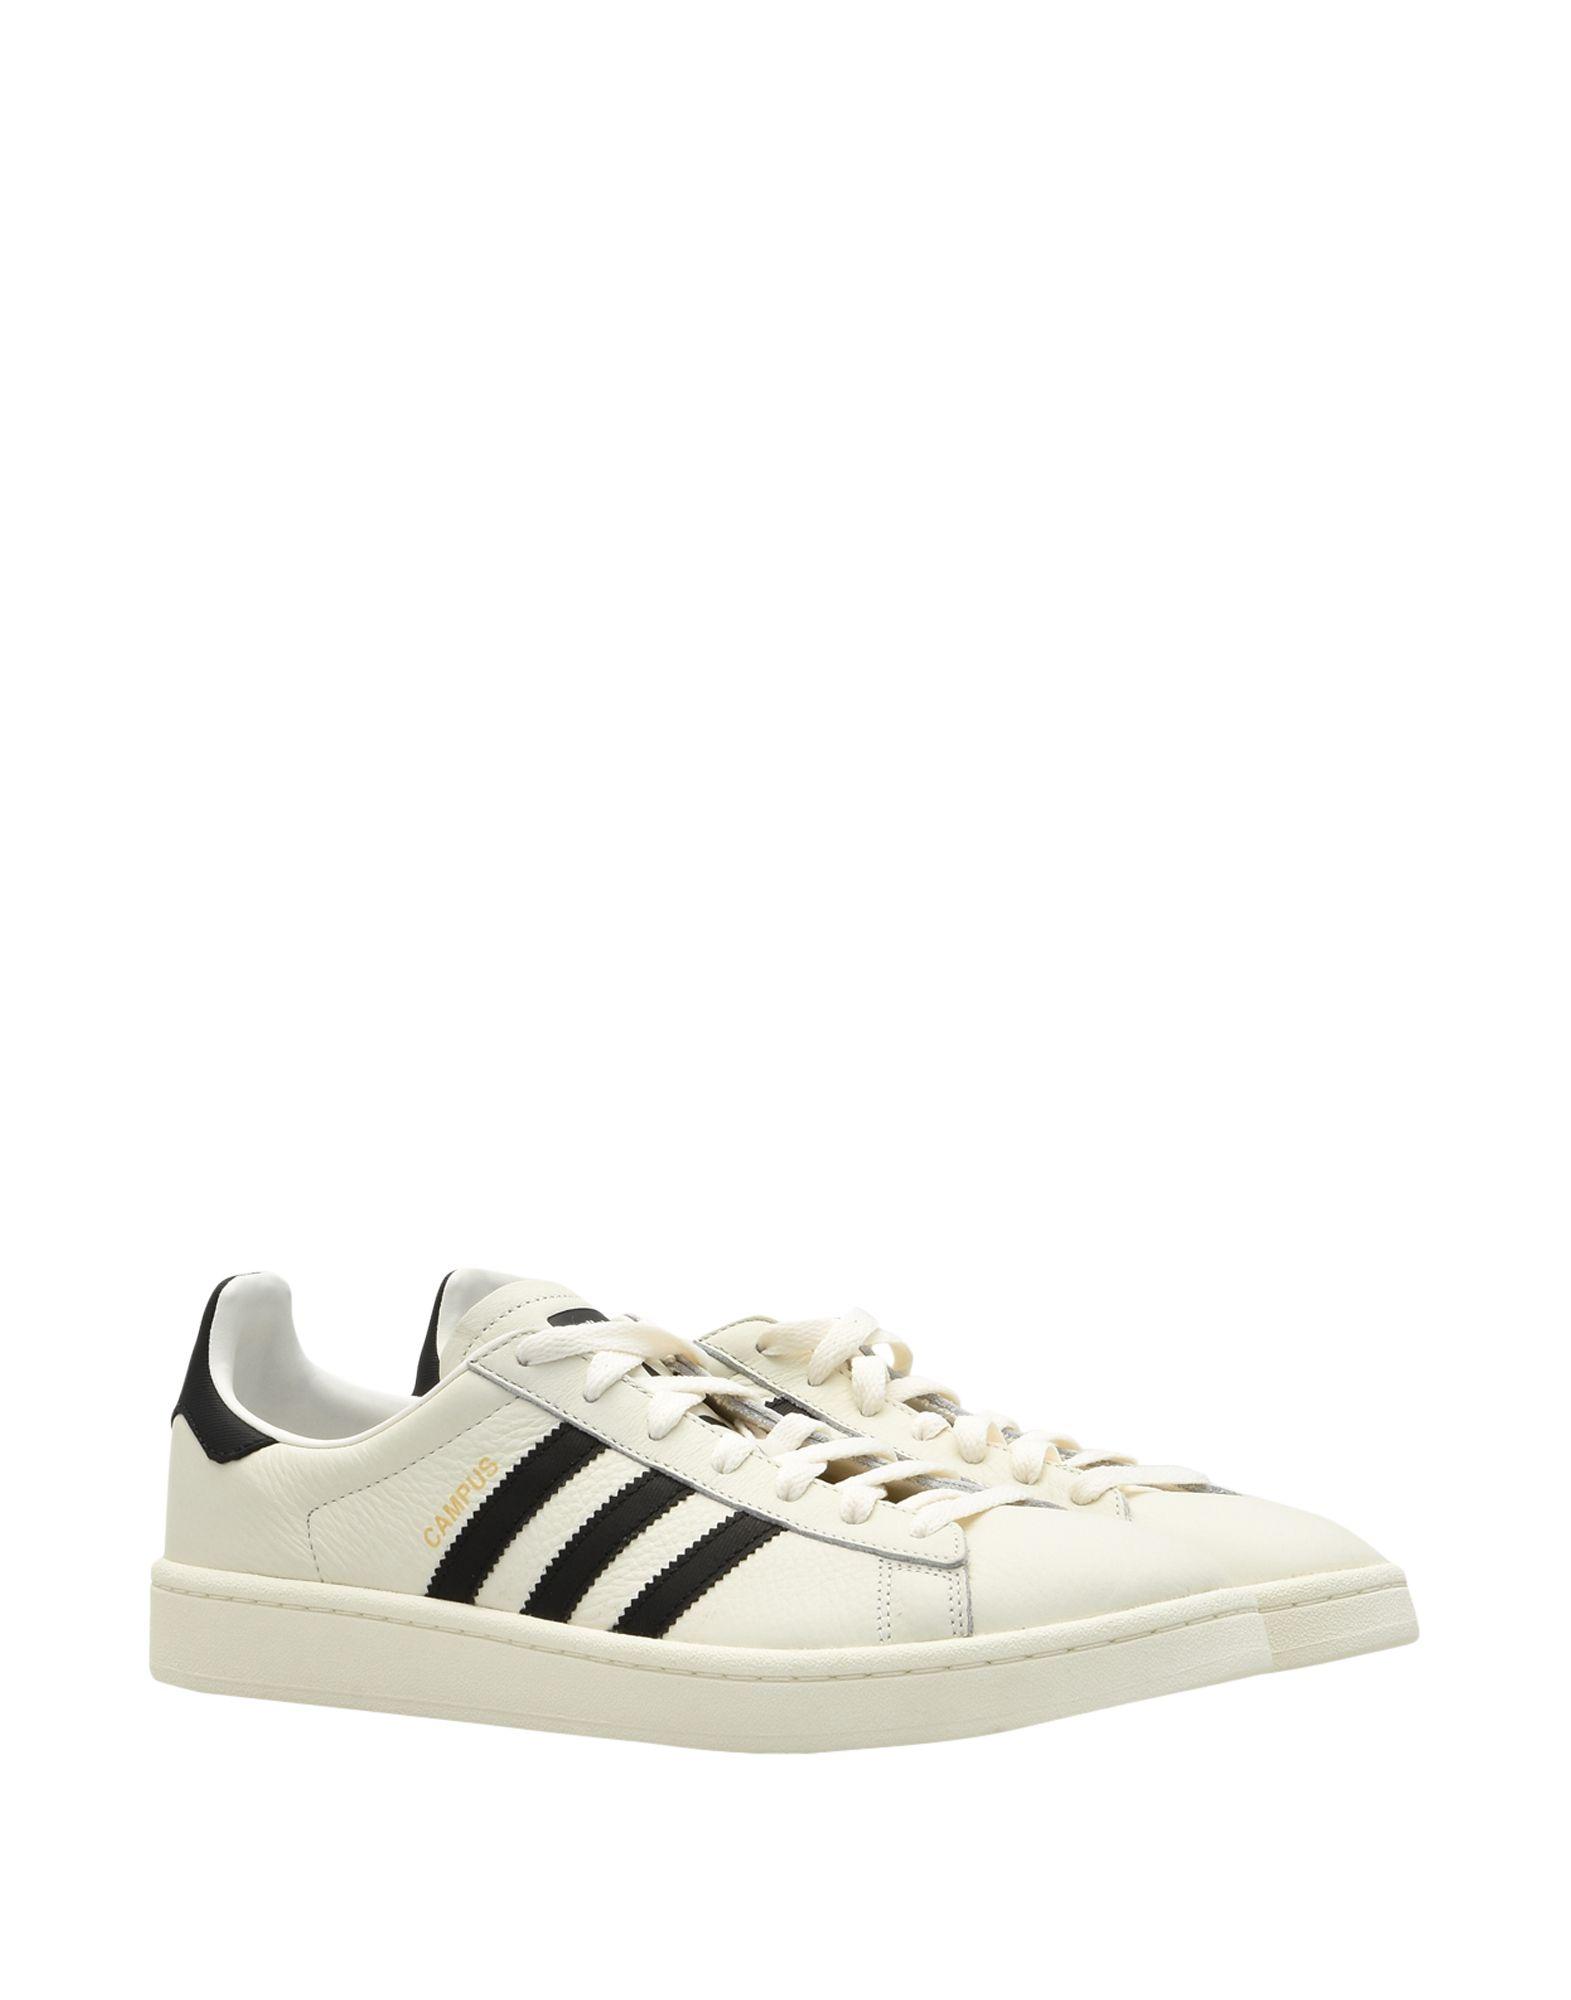 11496736JO Adidas Originals Campus  11496736JO  Heiße Schuhe 7fb3f5